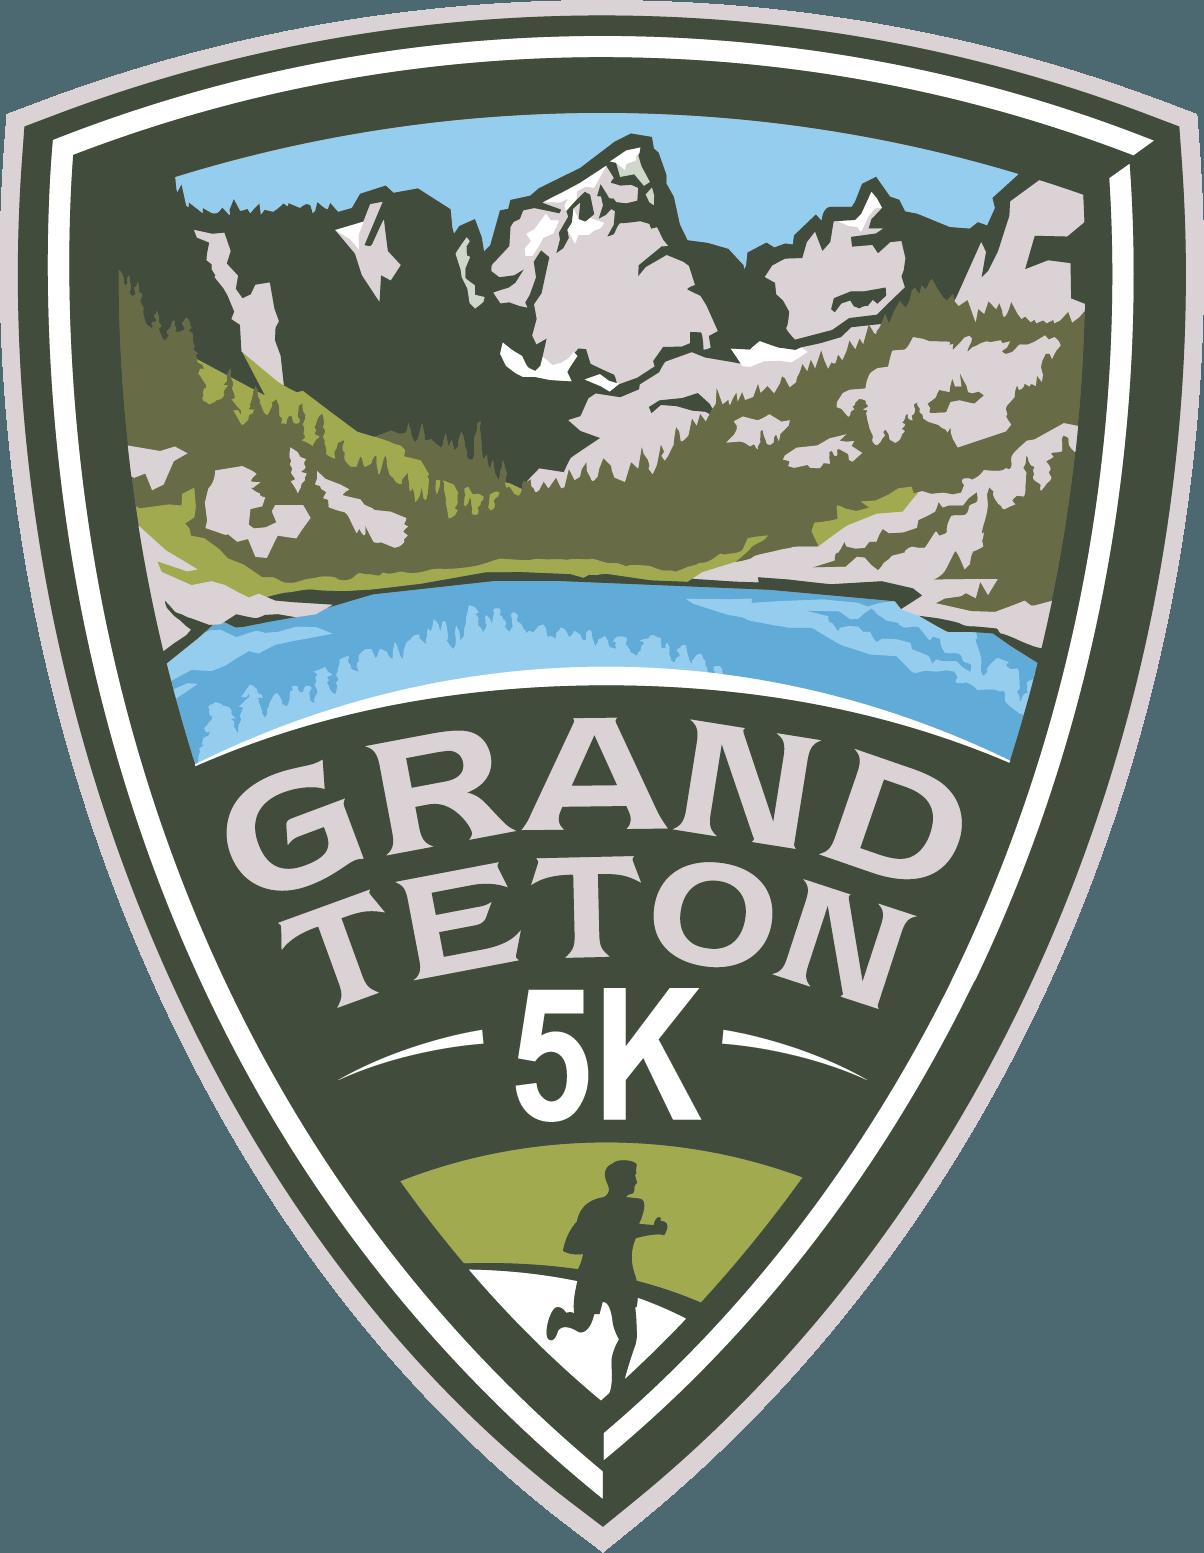 GrandTeton5K 4